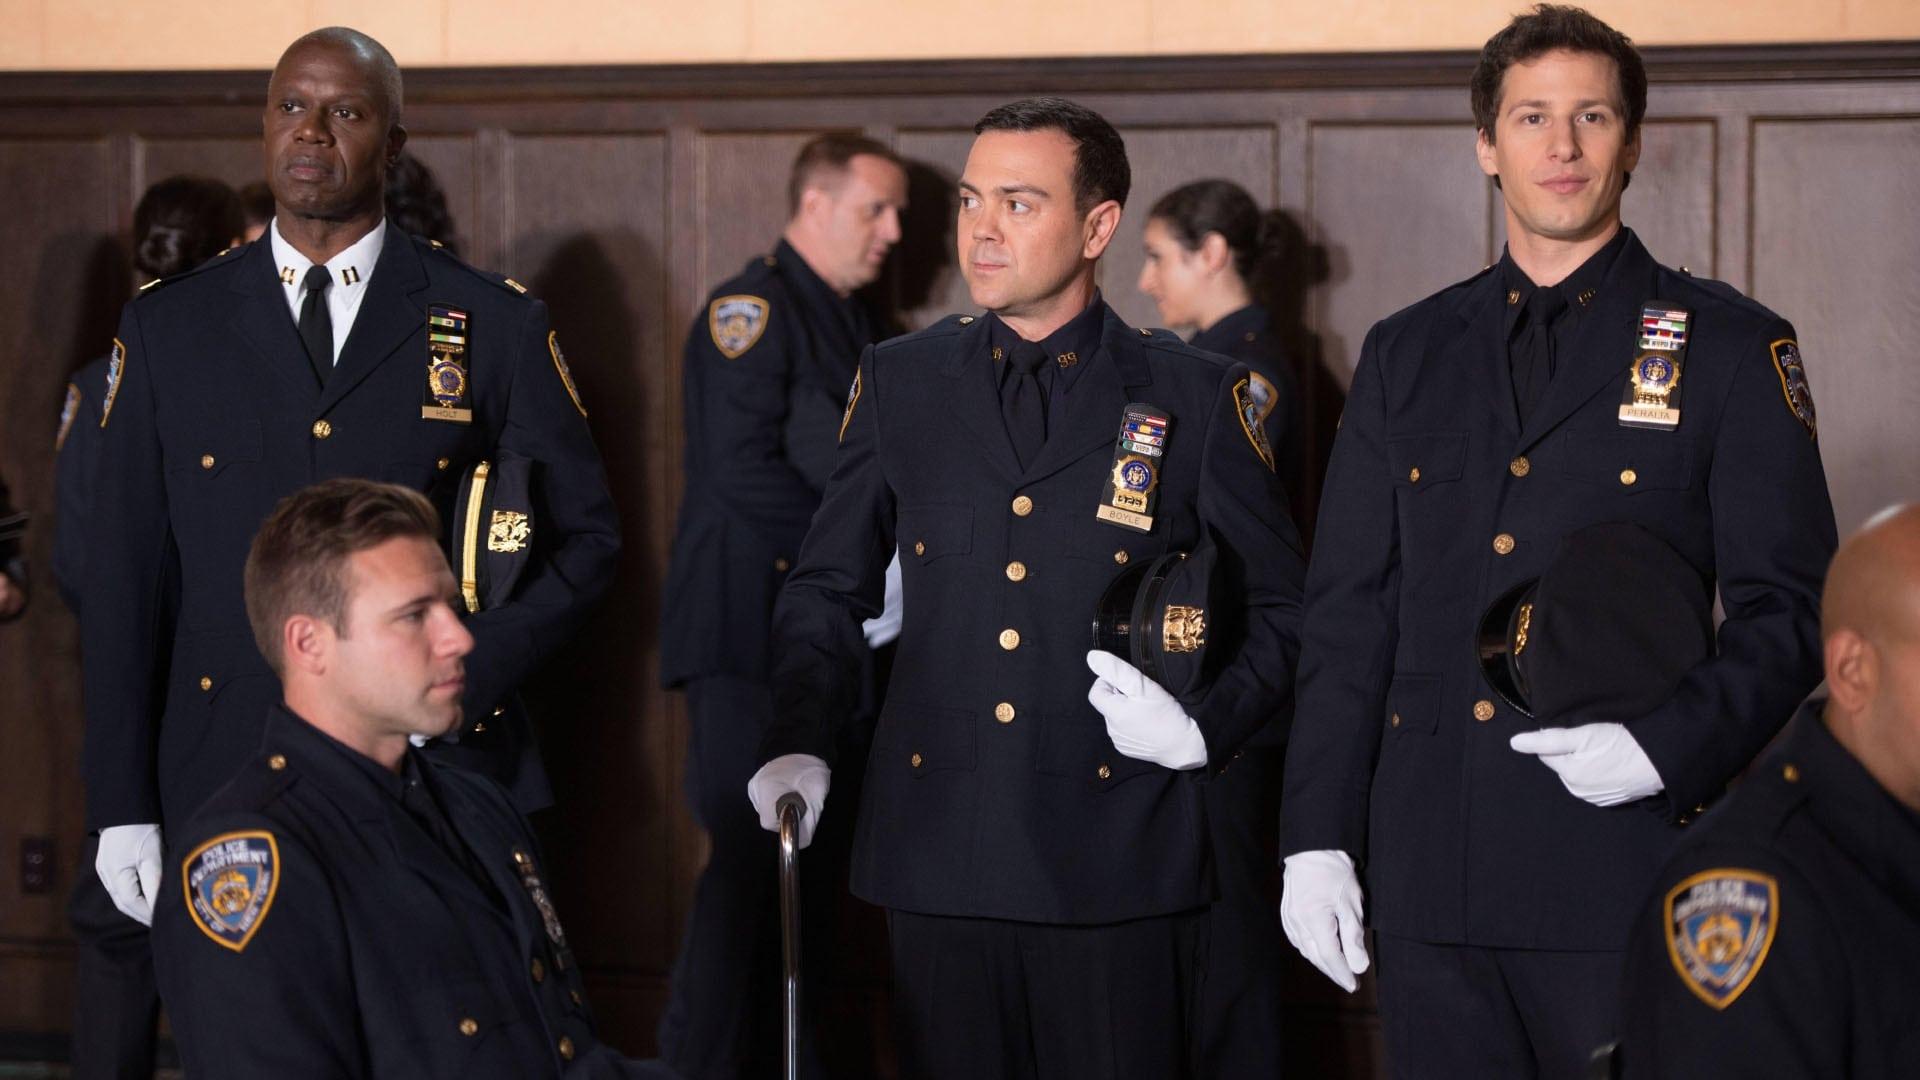 Brooklyn Nine-Nine - Season 1 Episode 13 : The Bet